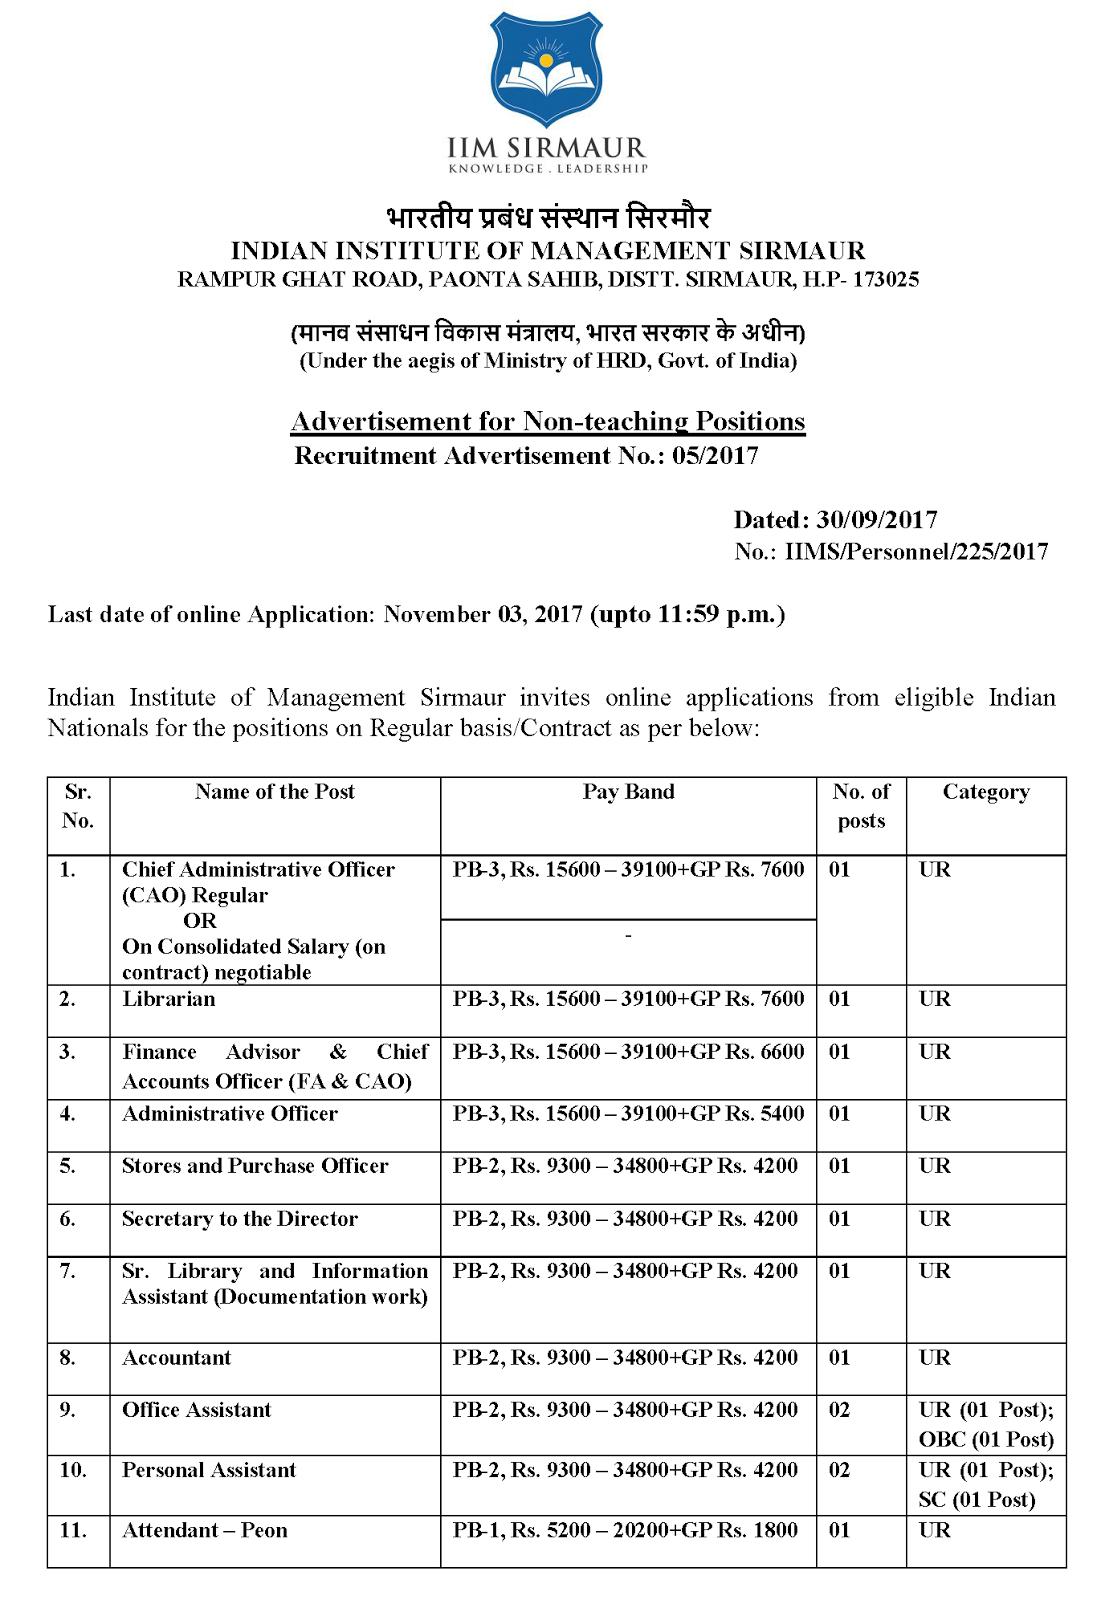 Librarian and slia vacancy at iim sirmaur himachal pradesh